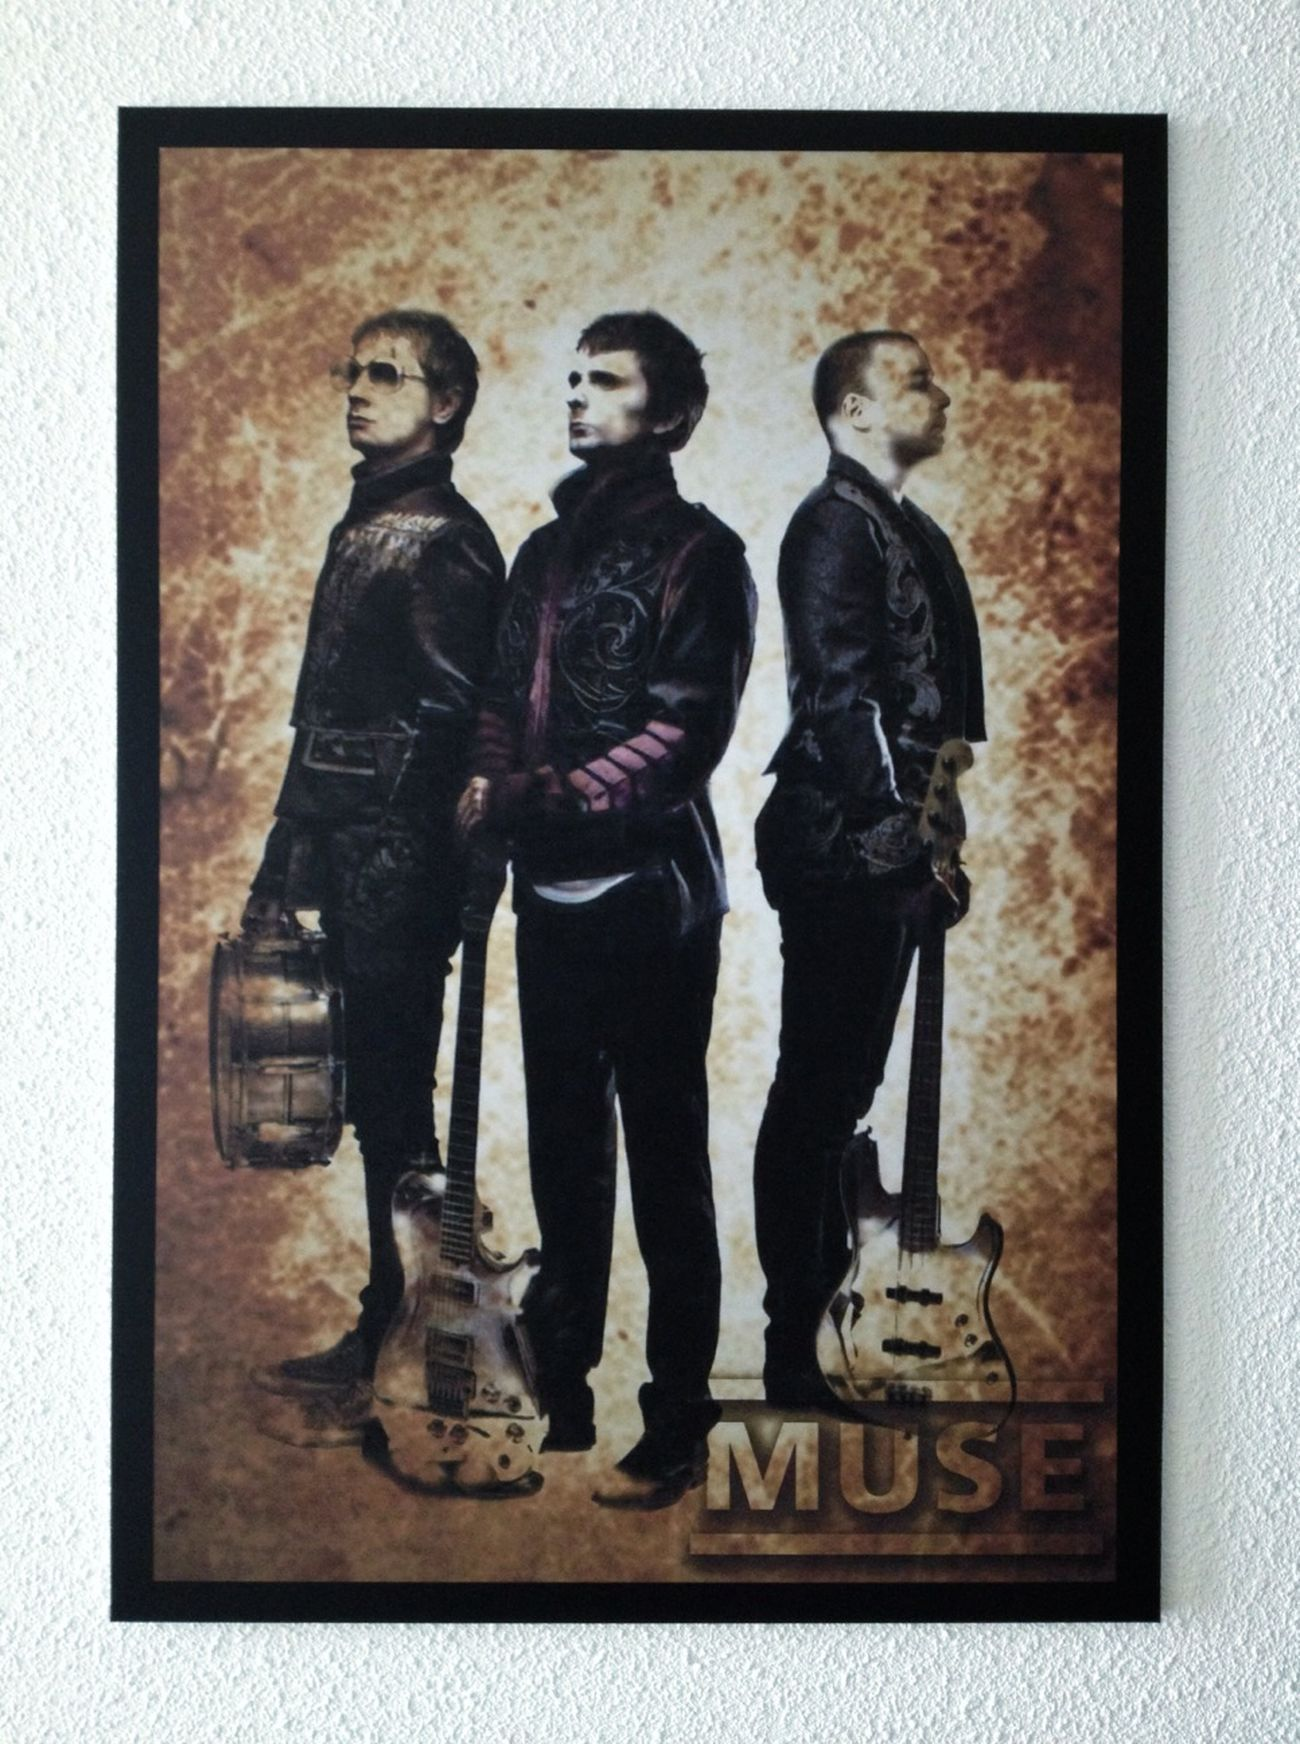 Muse My Favourite Band.